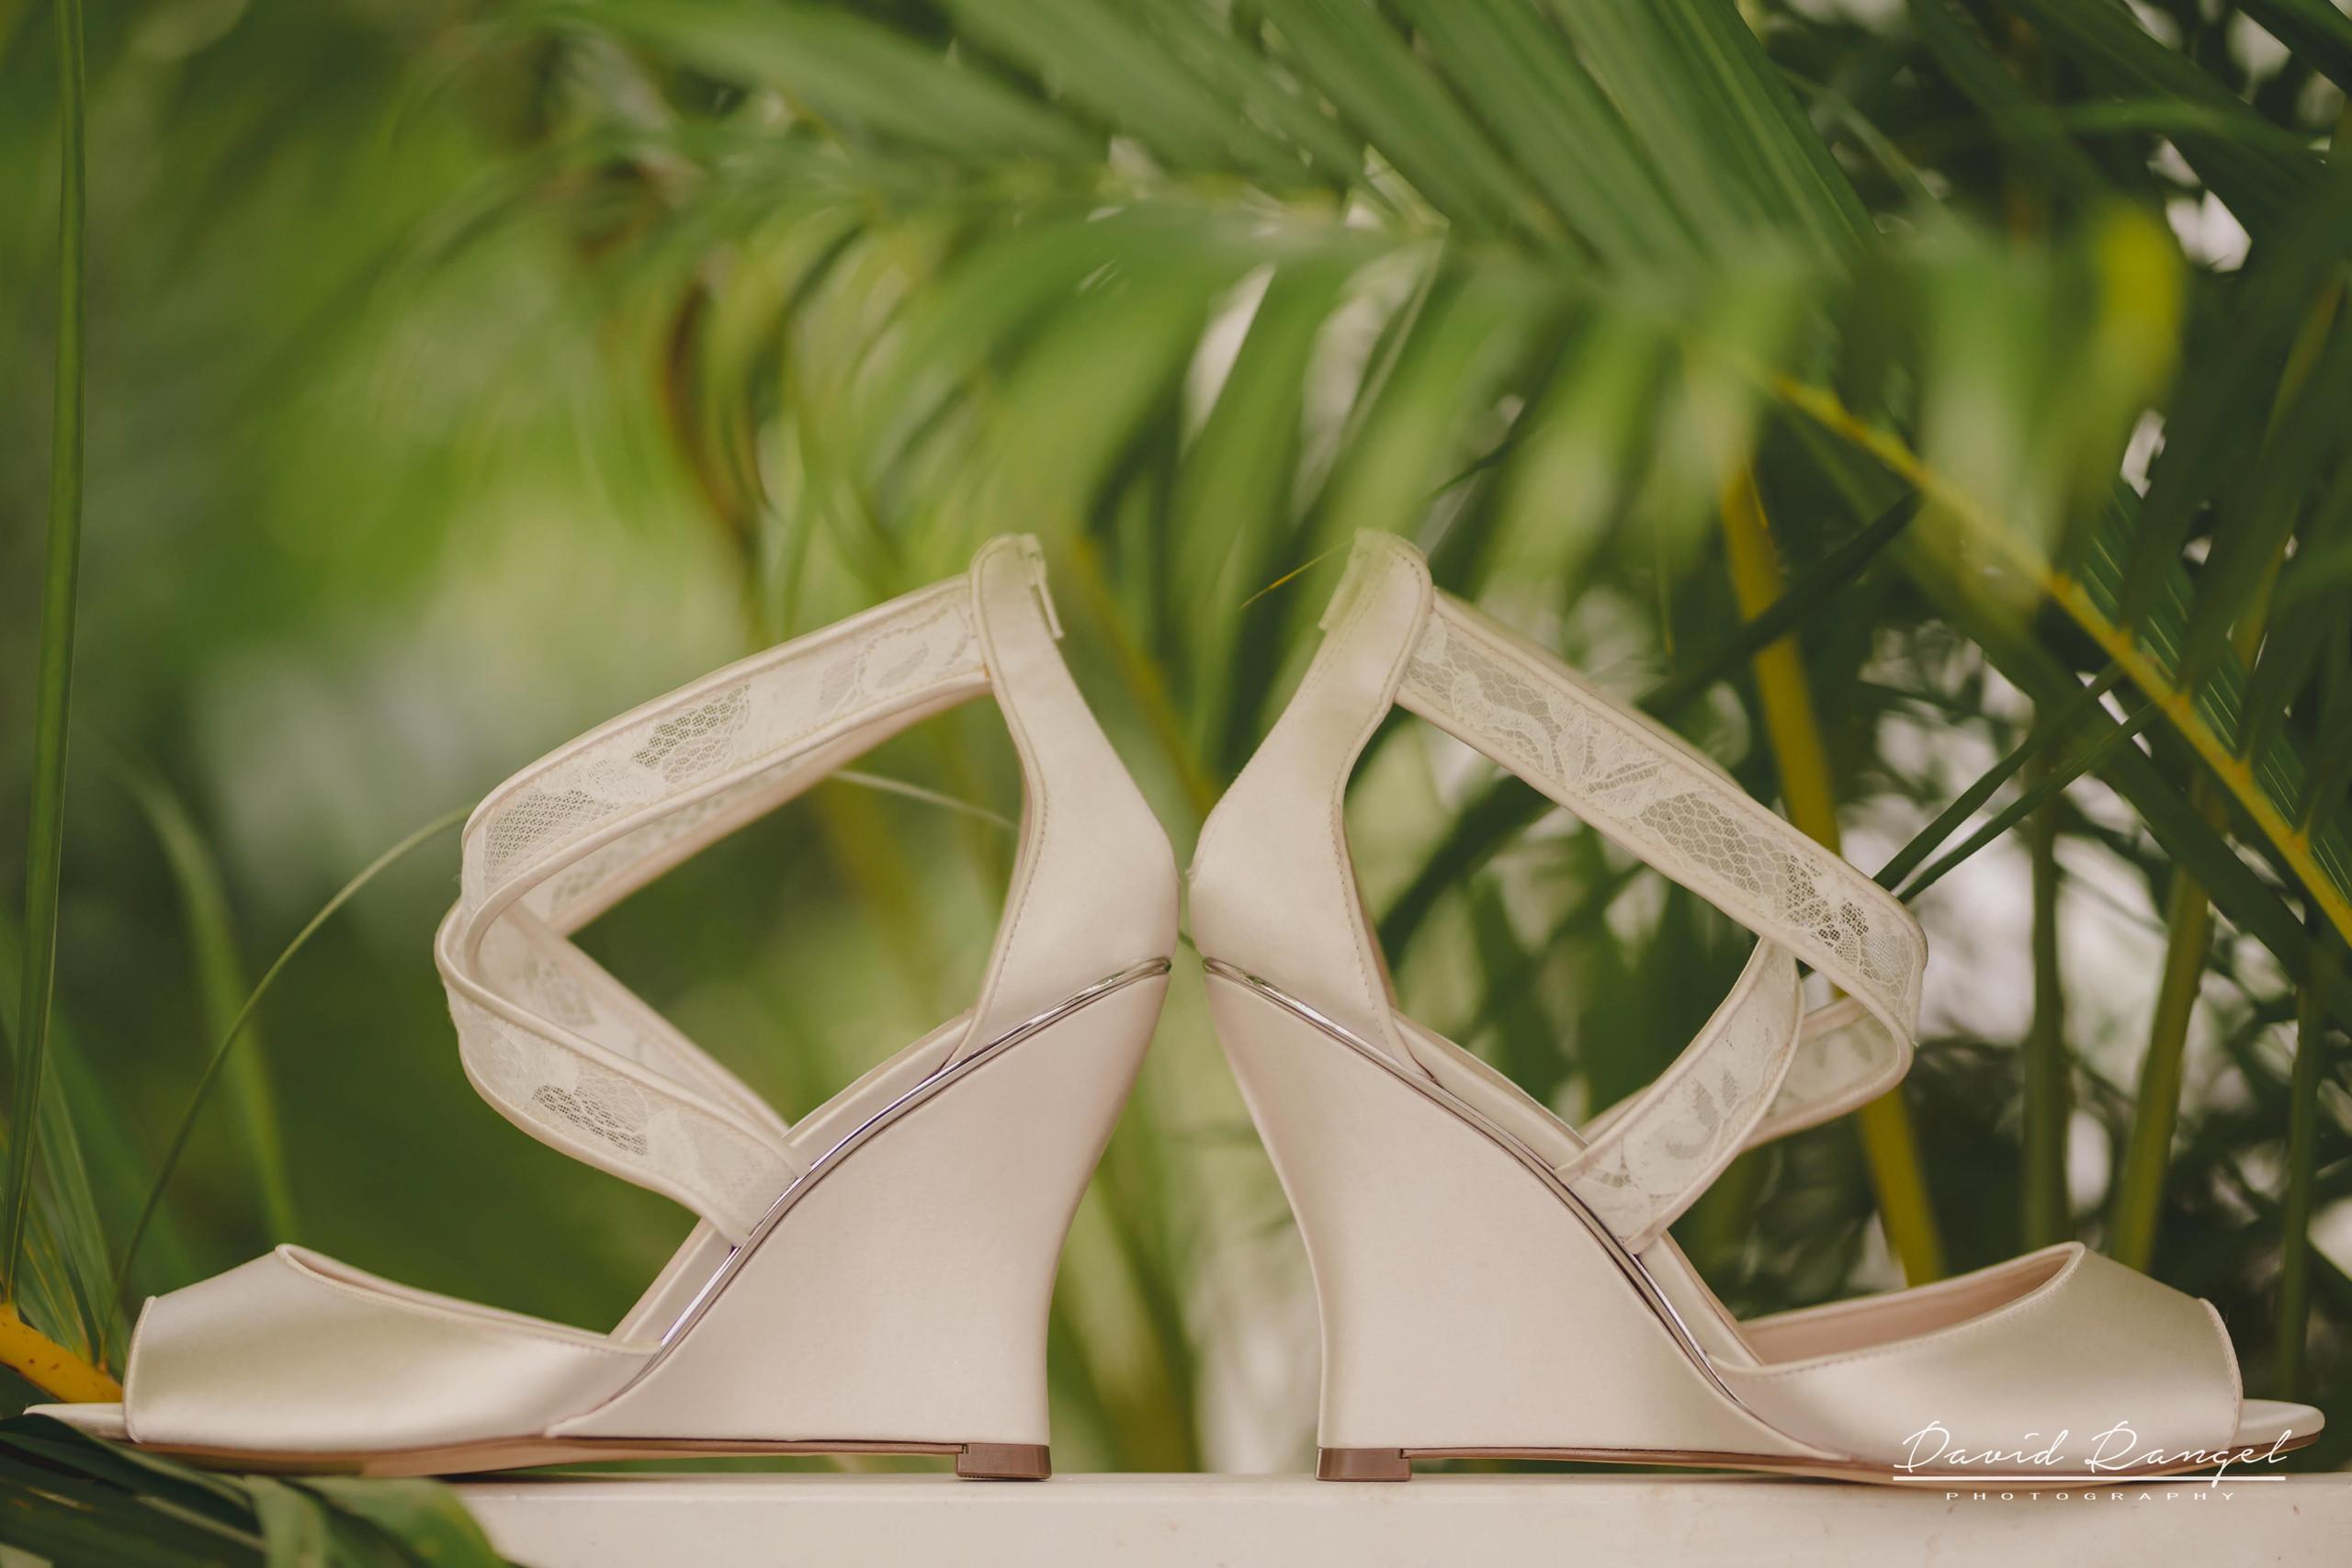 bride+getting+ready+shadow+earring++bathrobe+natural+ligh+photo+destination+wedding+isla+blanca+smile+champagne+mirror+photo+celebration+drink+alcohol+shoes+garden